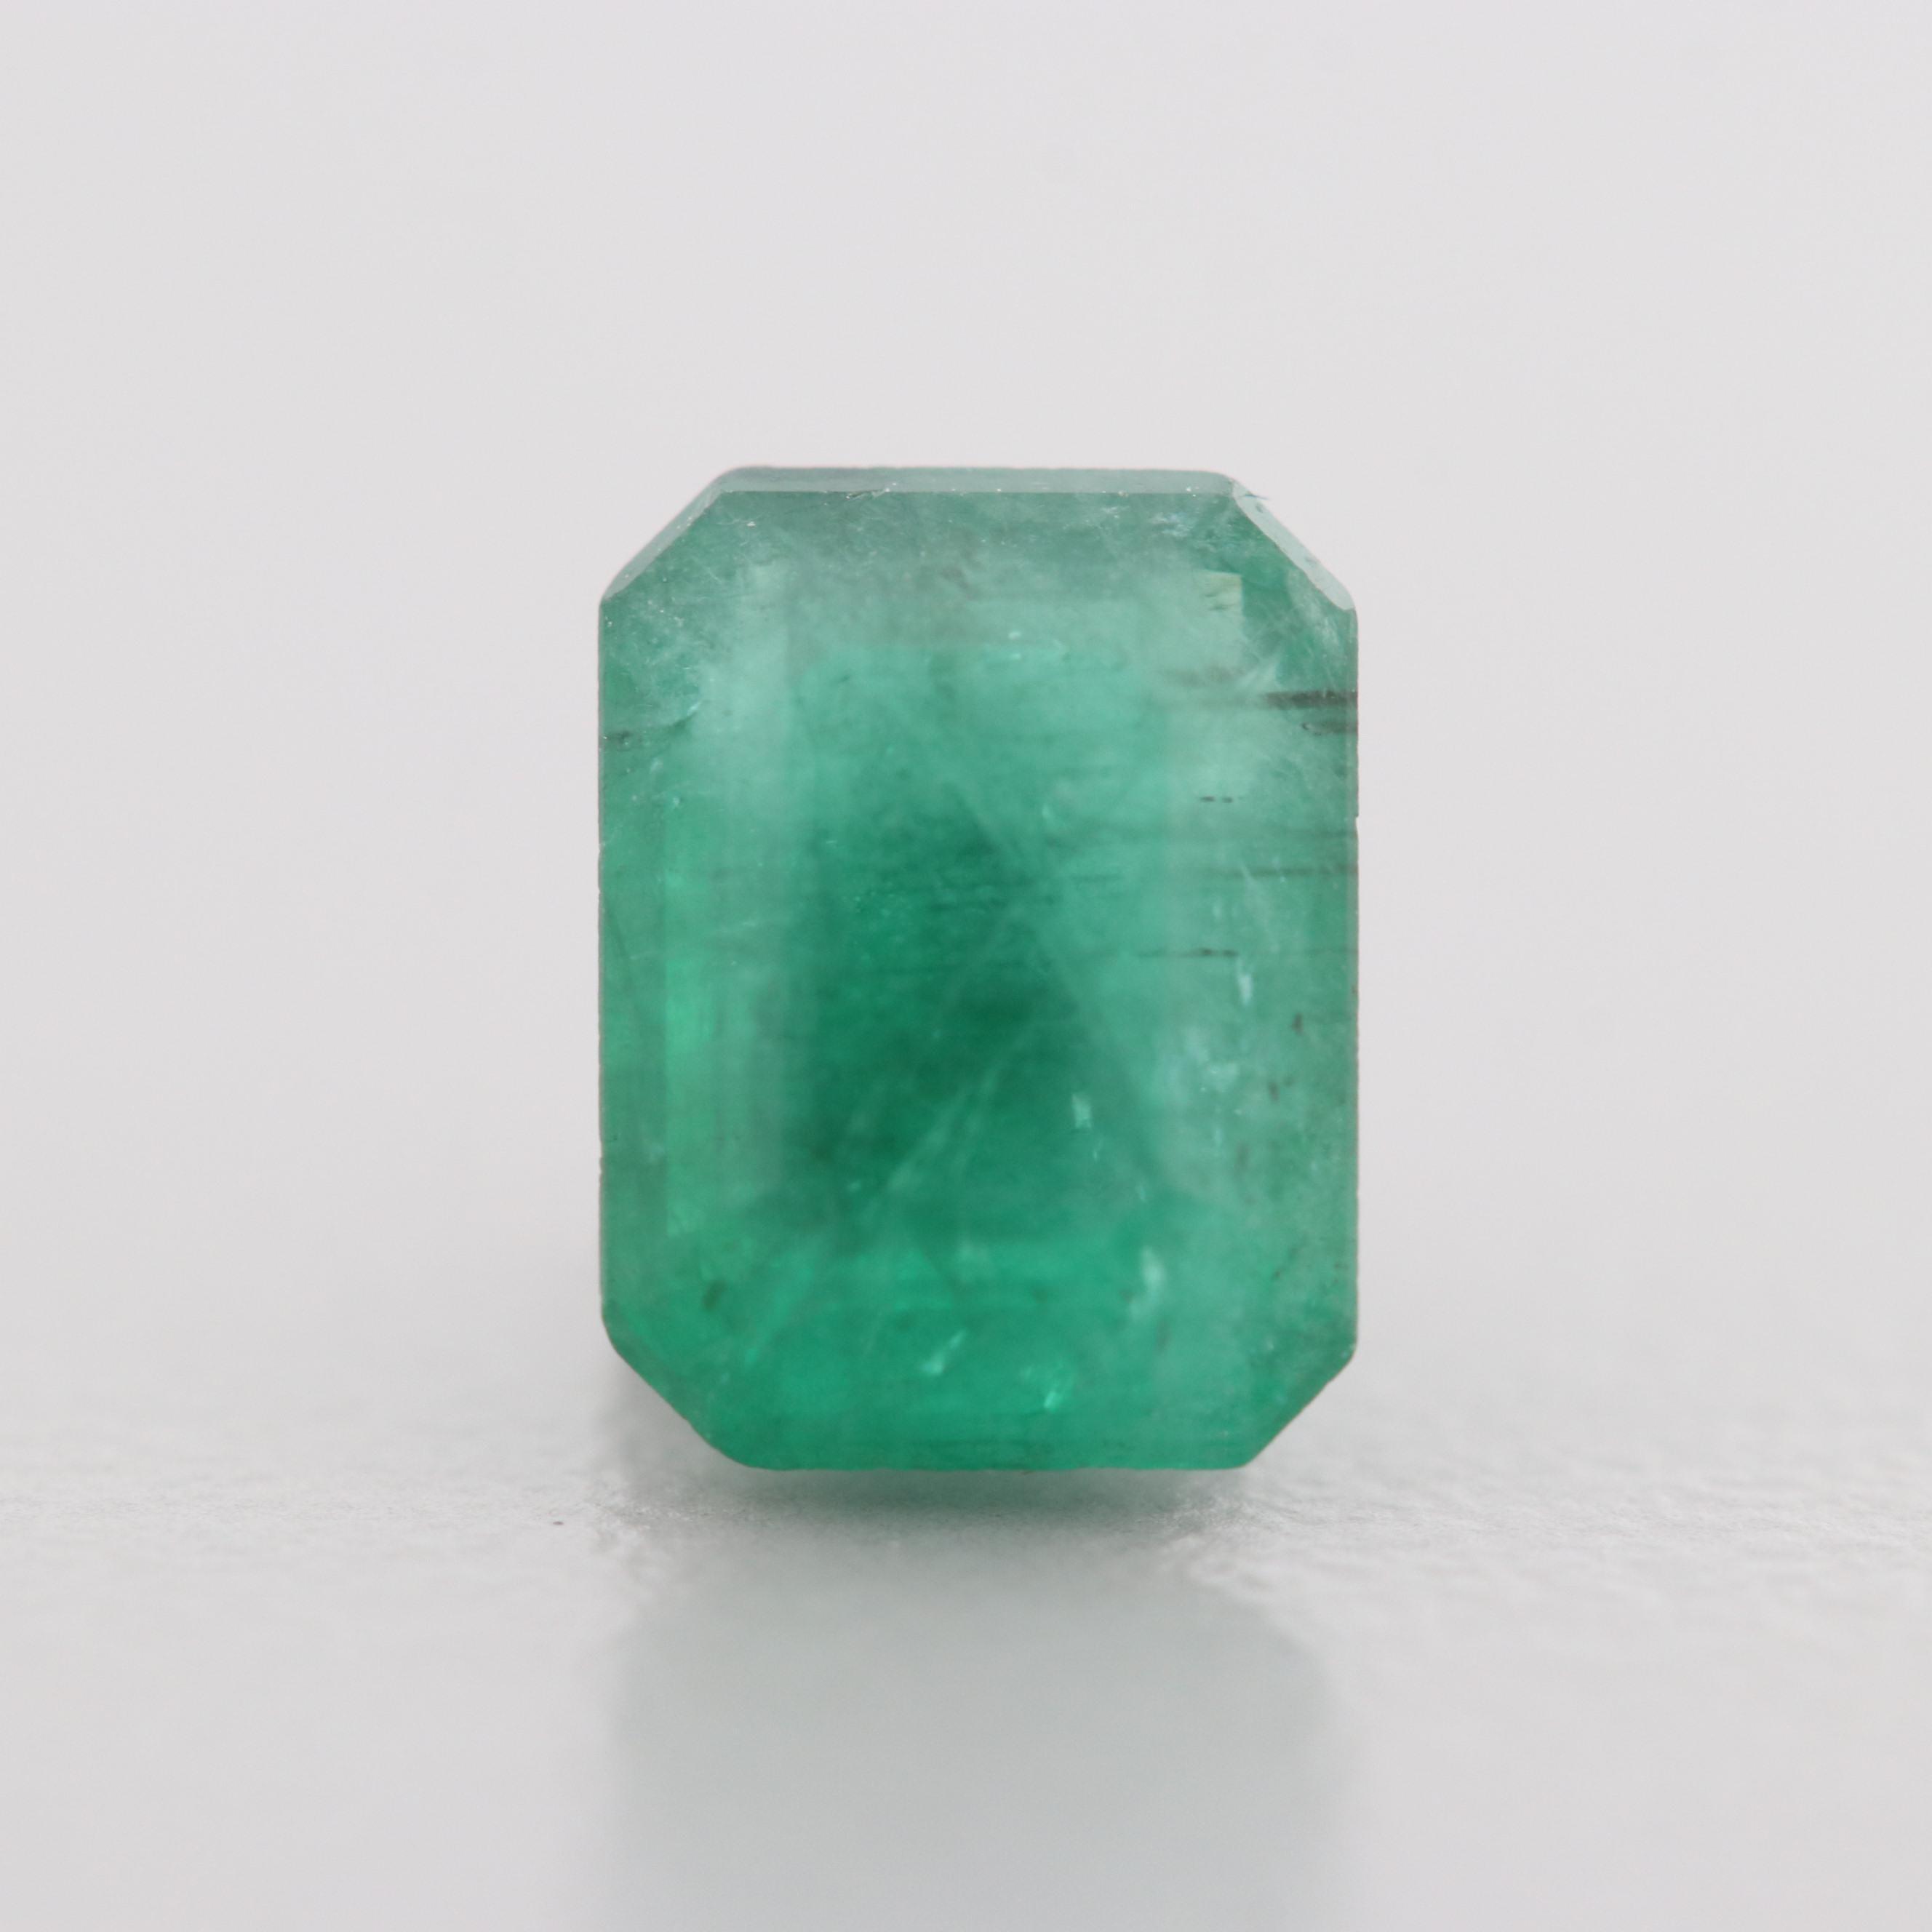 Loose 1.28 CT Emerald